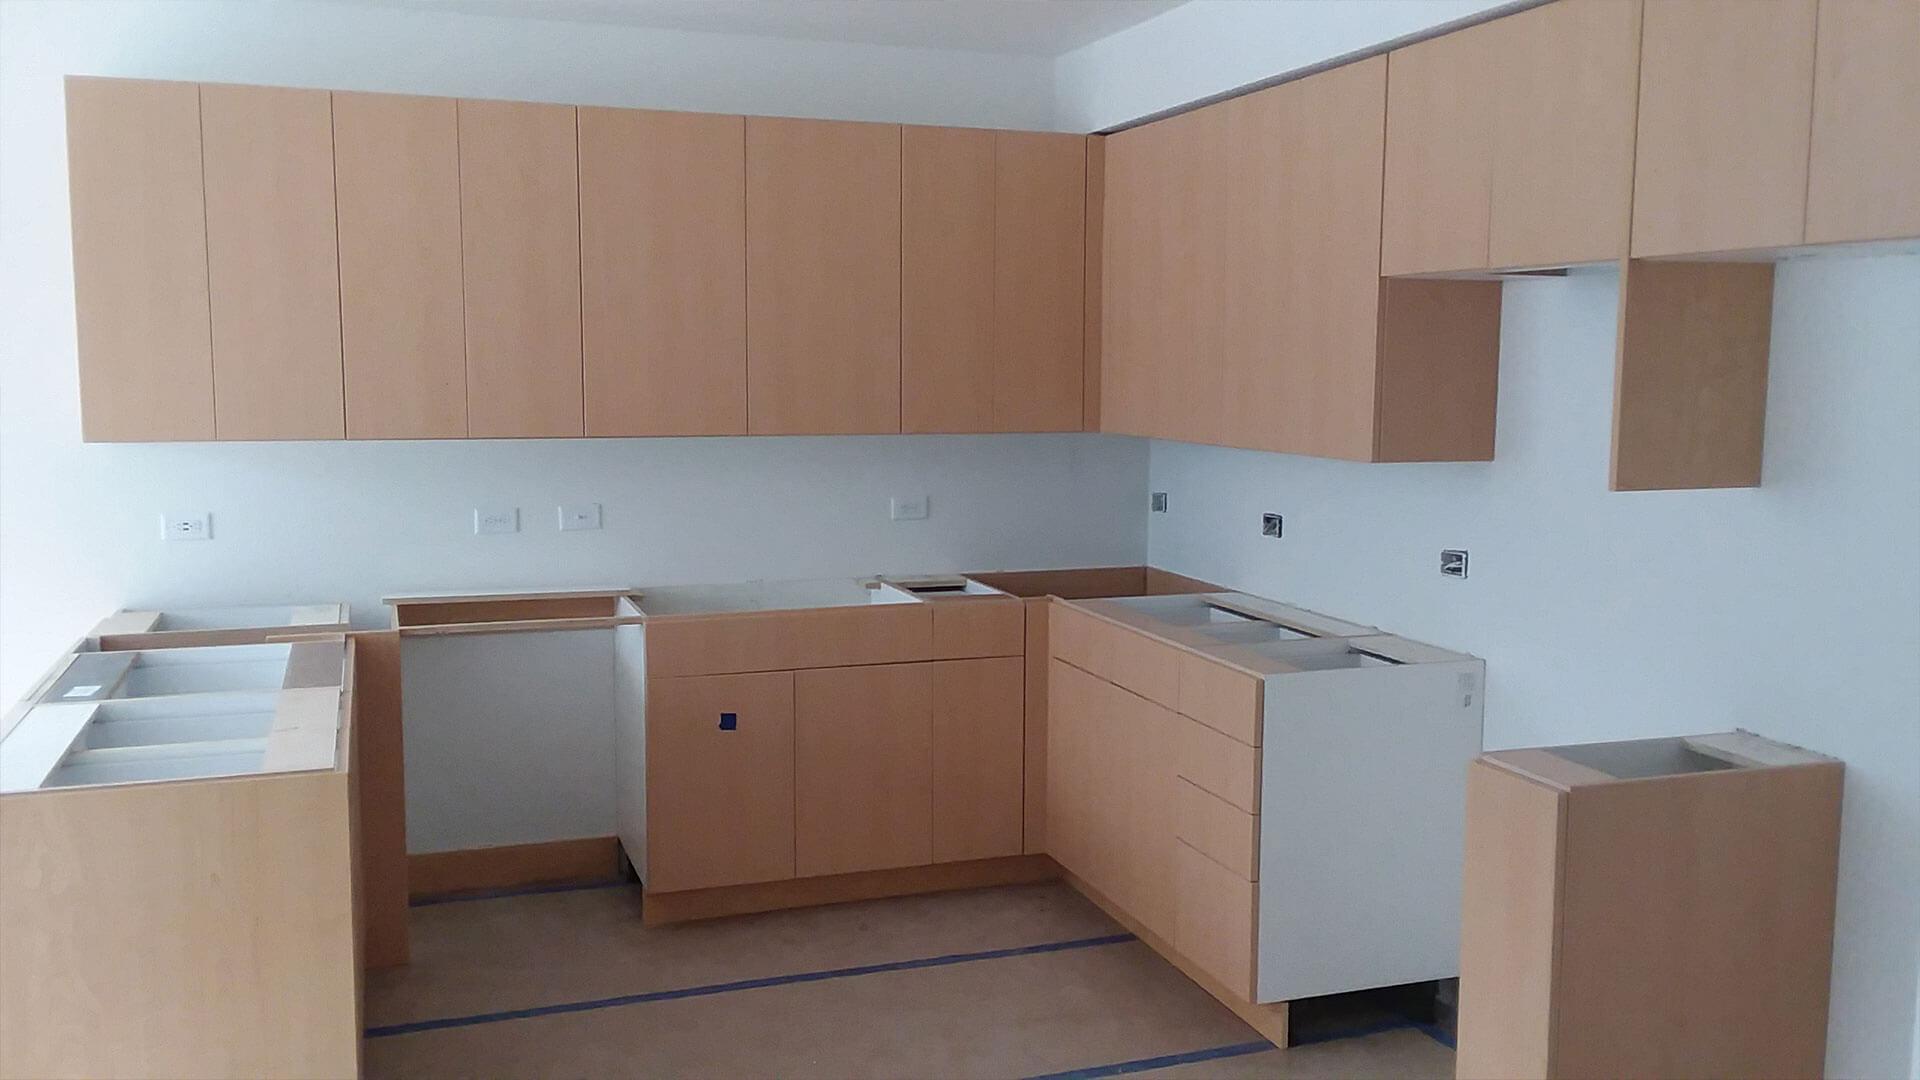 Halfway Built Room at Stateside Apartments